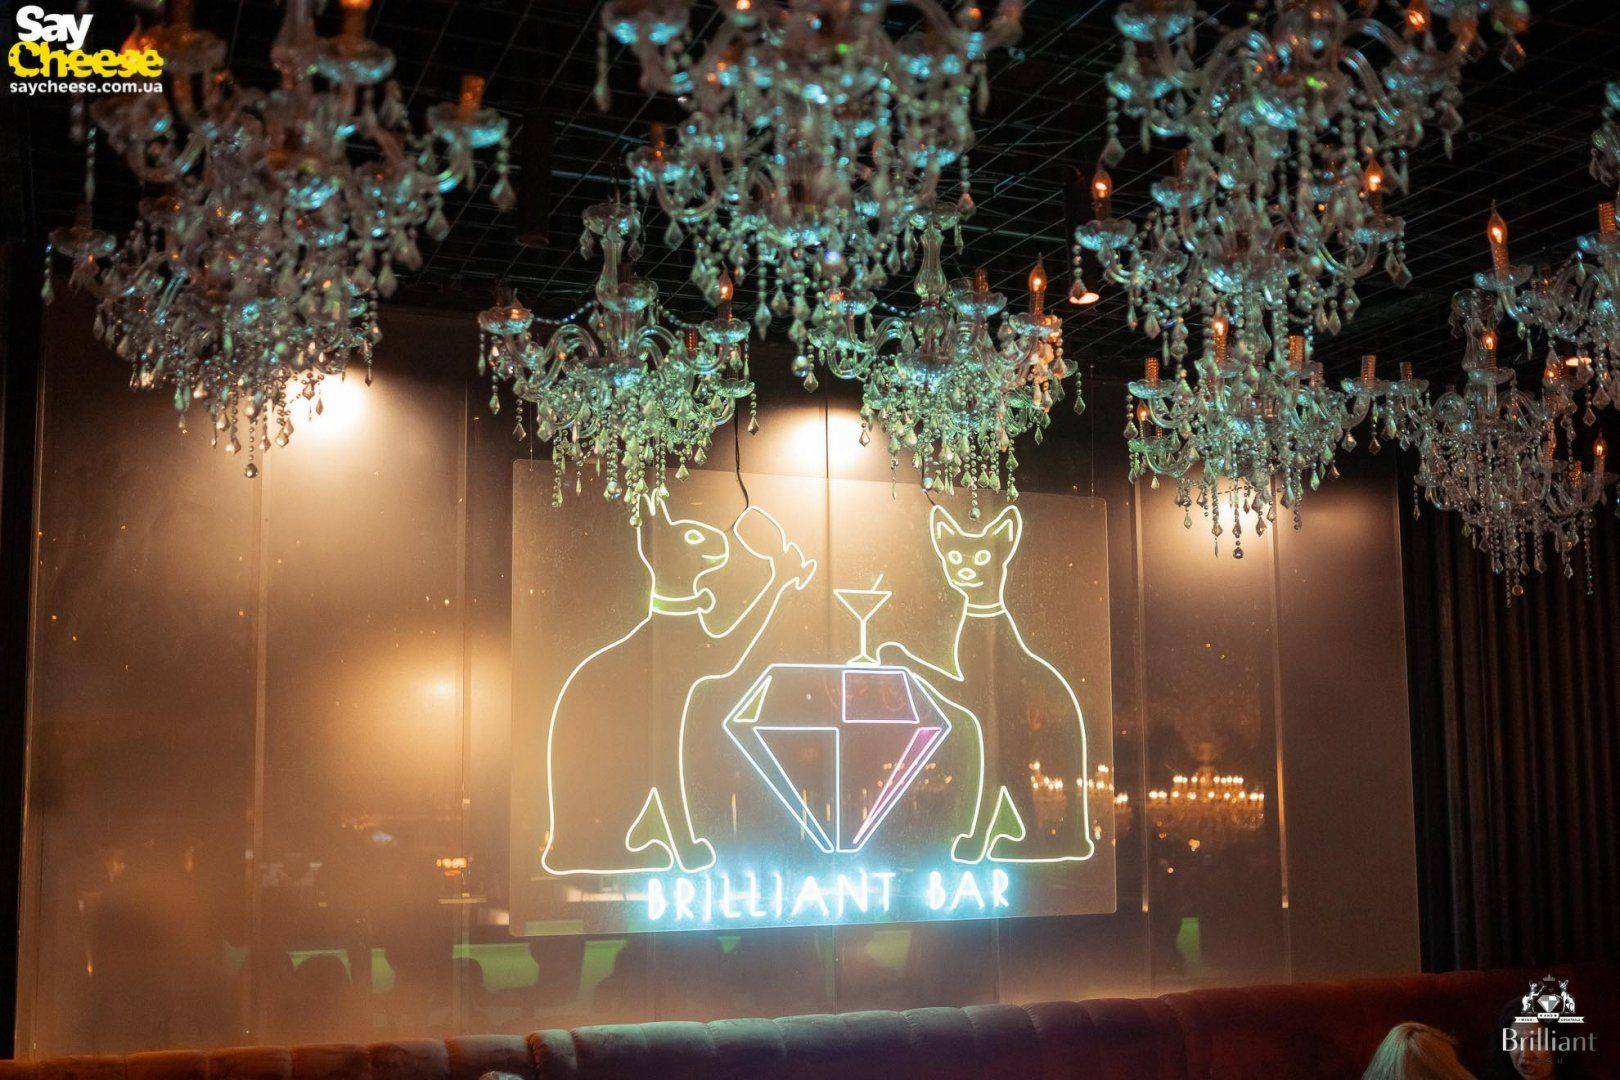 Бриллиант бар Харьков фотоотчет Saycheese 5.03